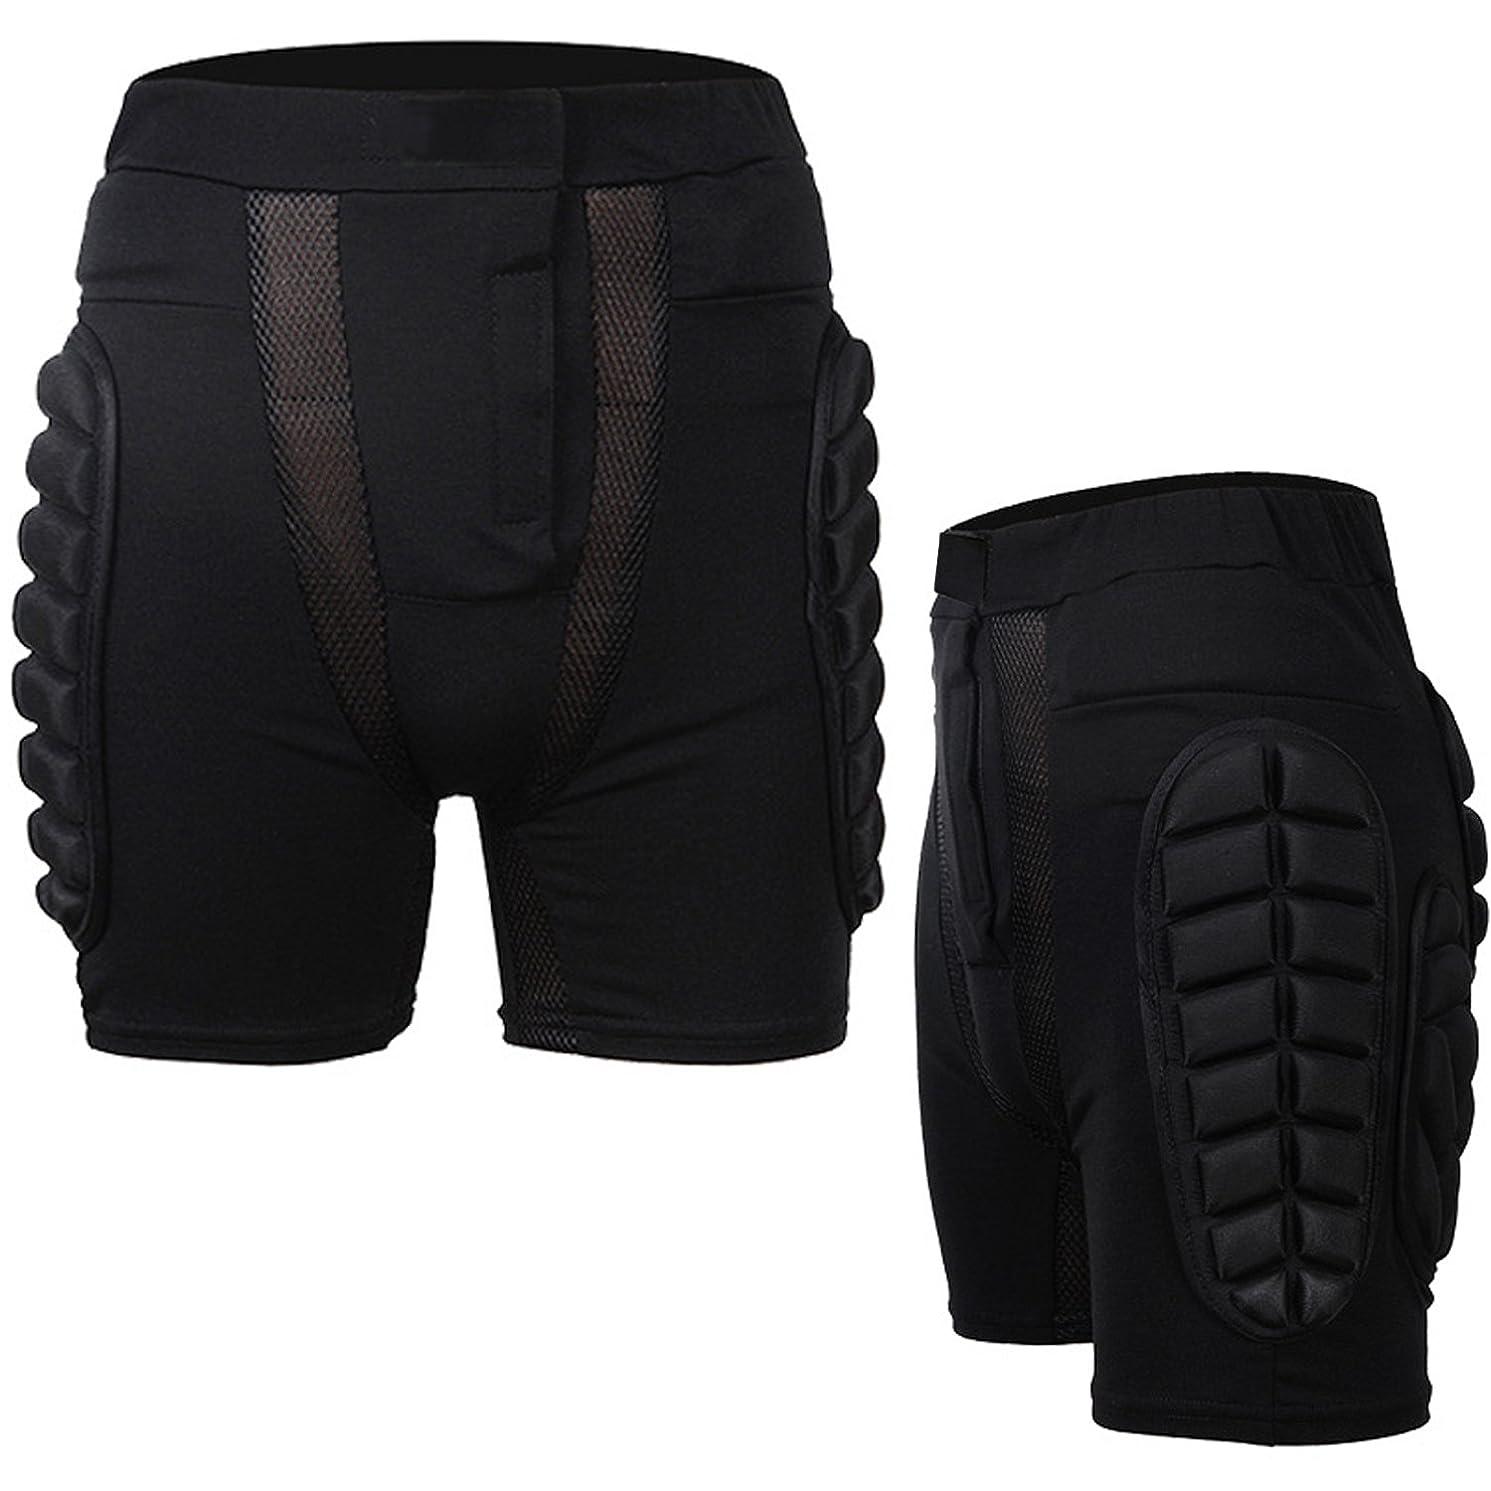 Guide 3D Hip Padded Shorts EVA Protective Pants for Outdoor Sports Skiiing Skating Snowboard Skateboarding Cycling Protection